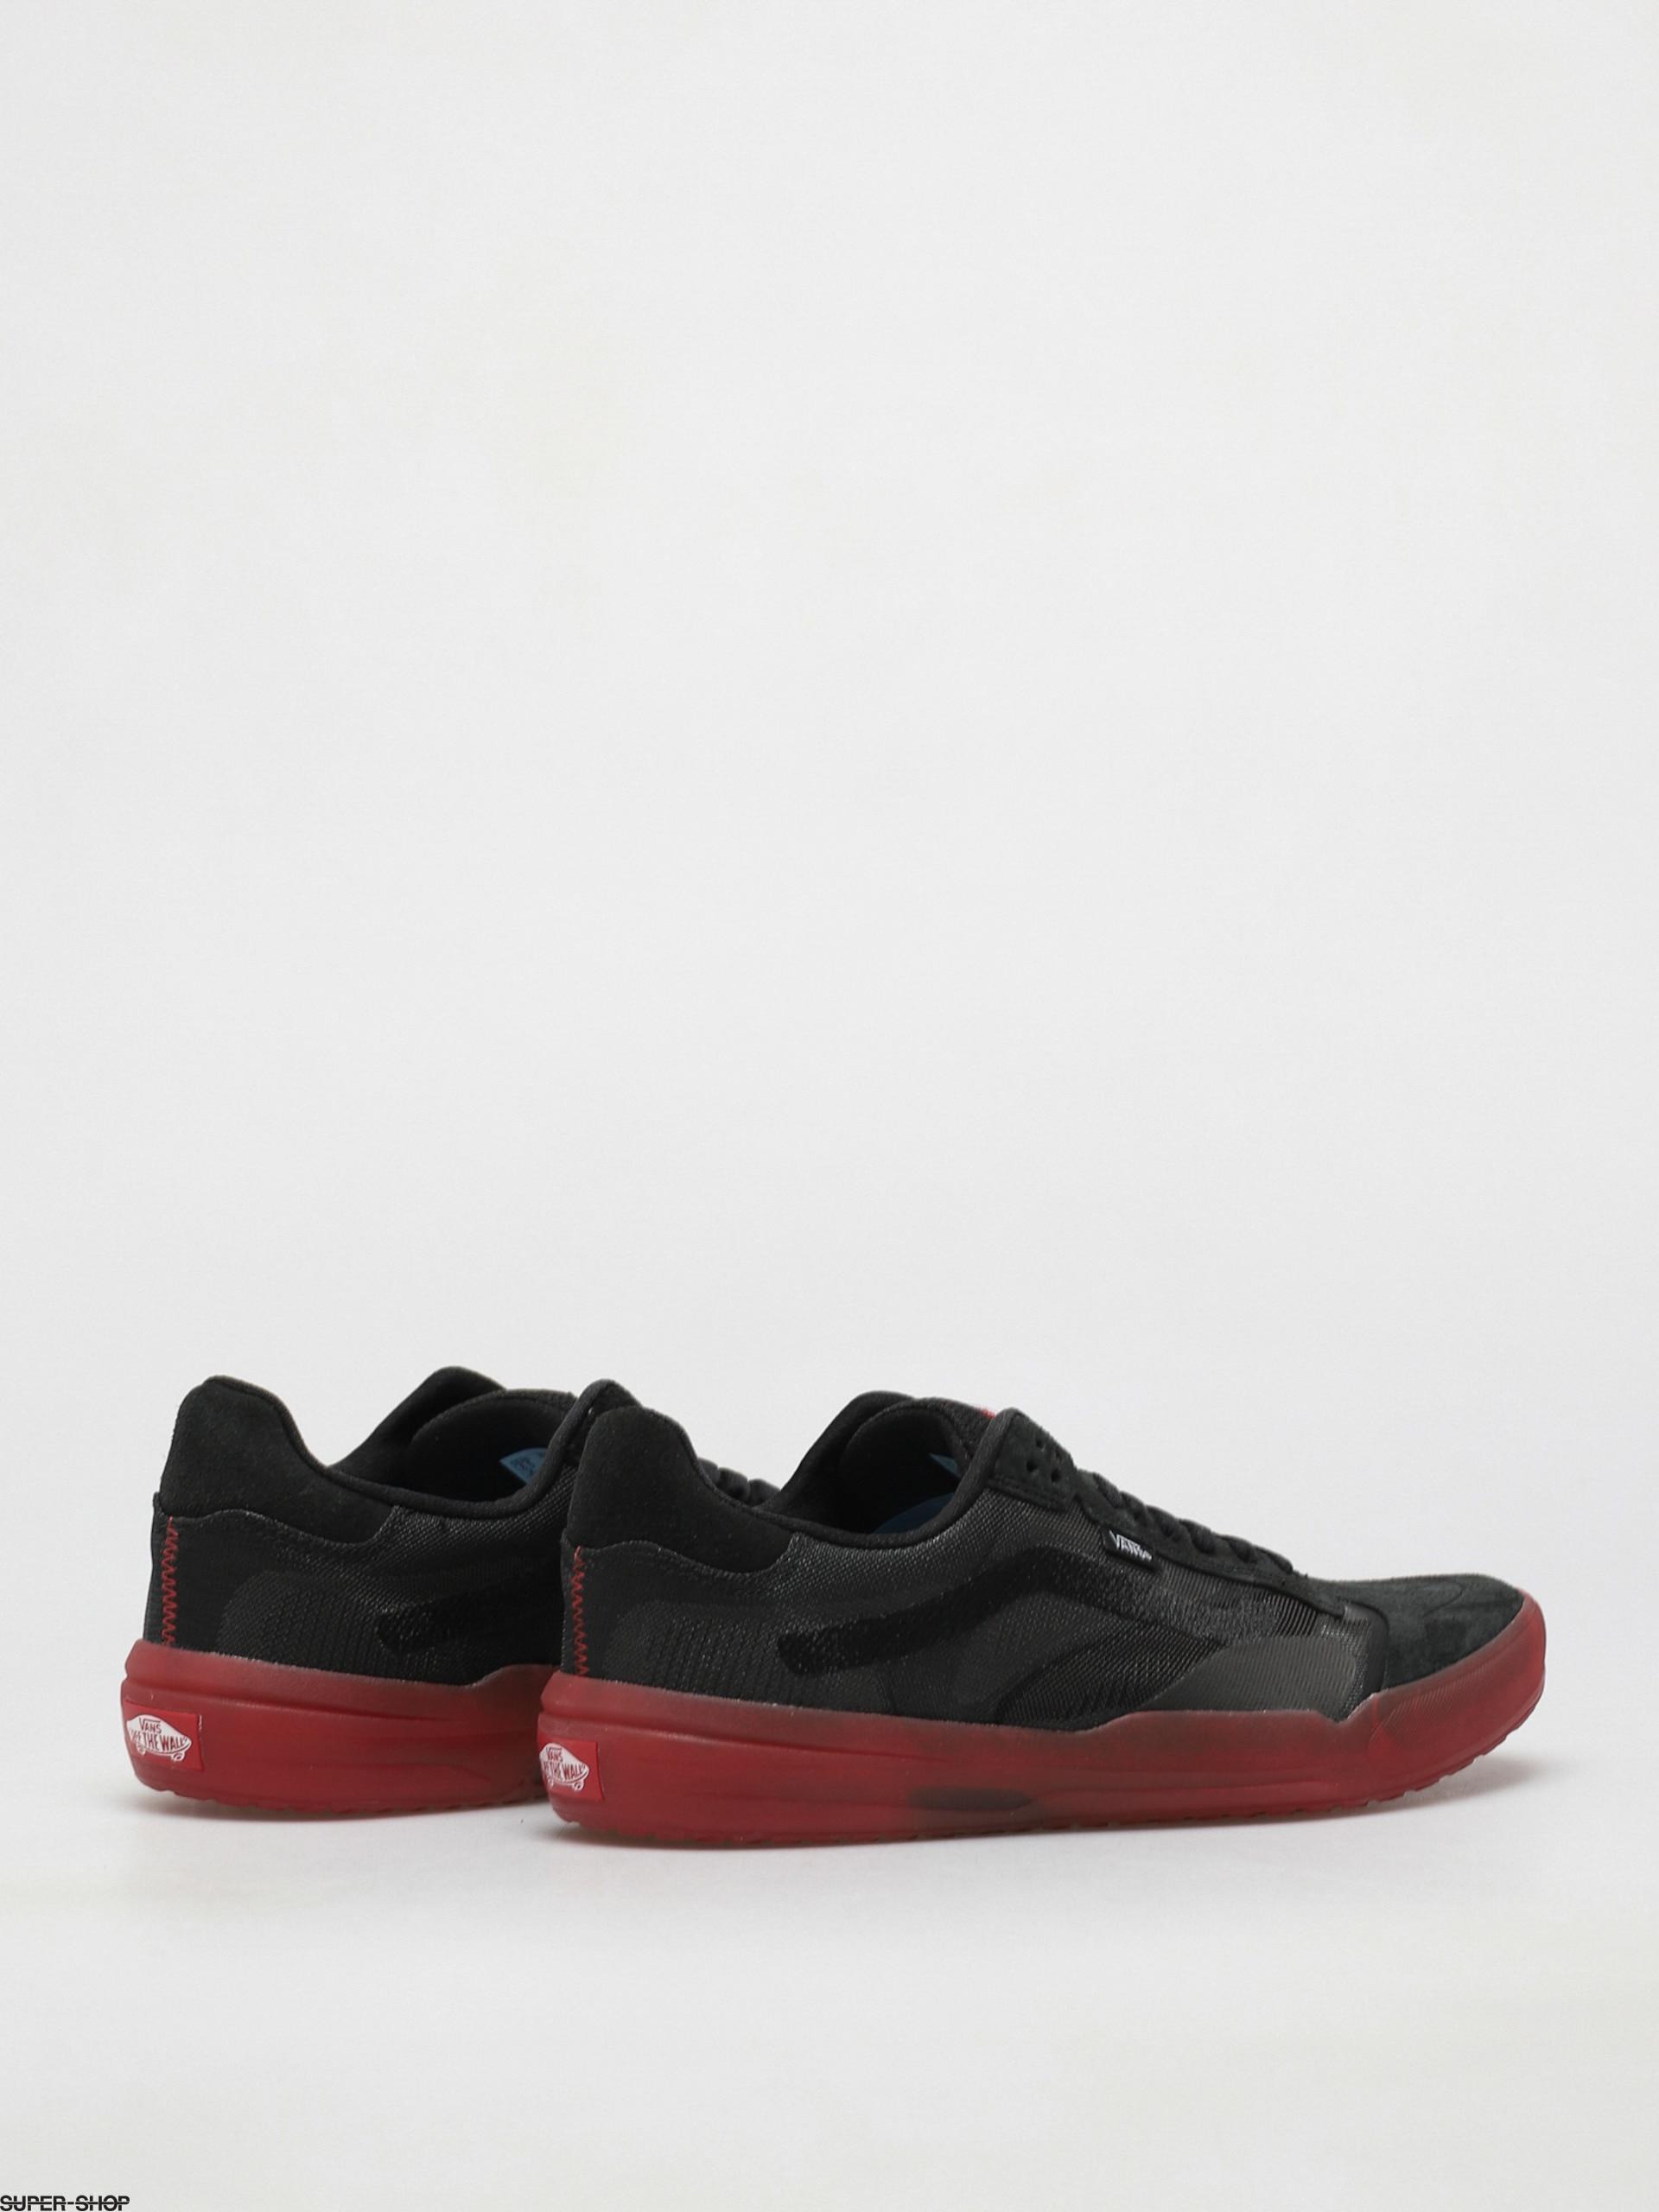 Vans Evdnt Ultimatewaffle Shoes (black/red)